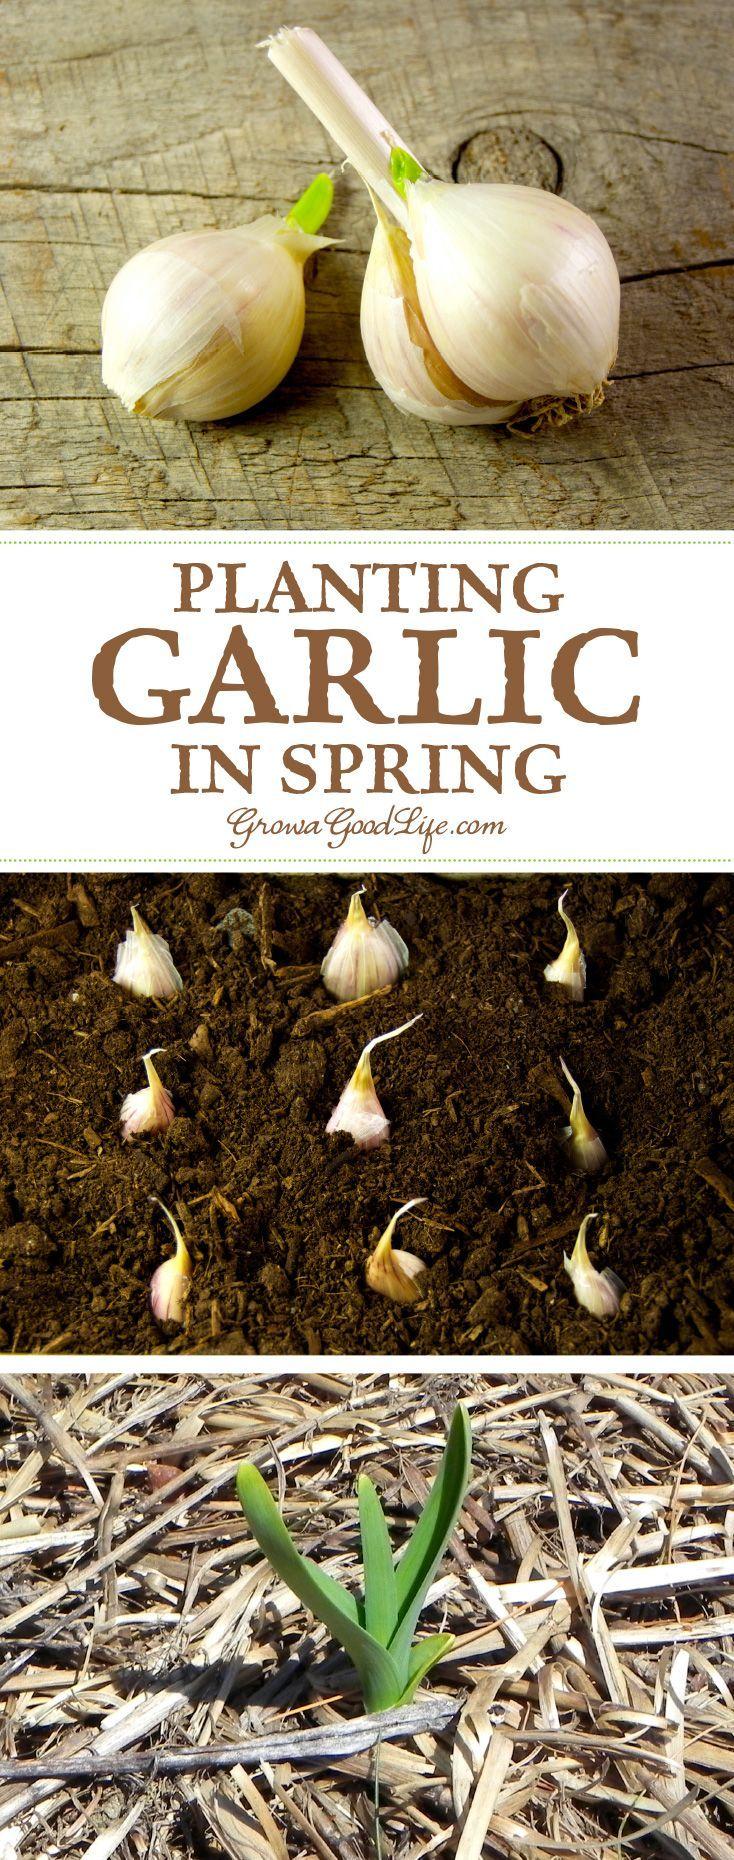 Planting Spring Garlic Planting Garlic In Spring 400 x 300